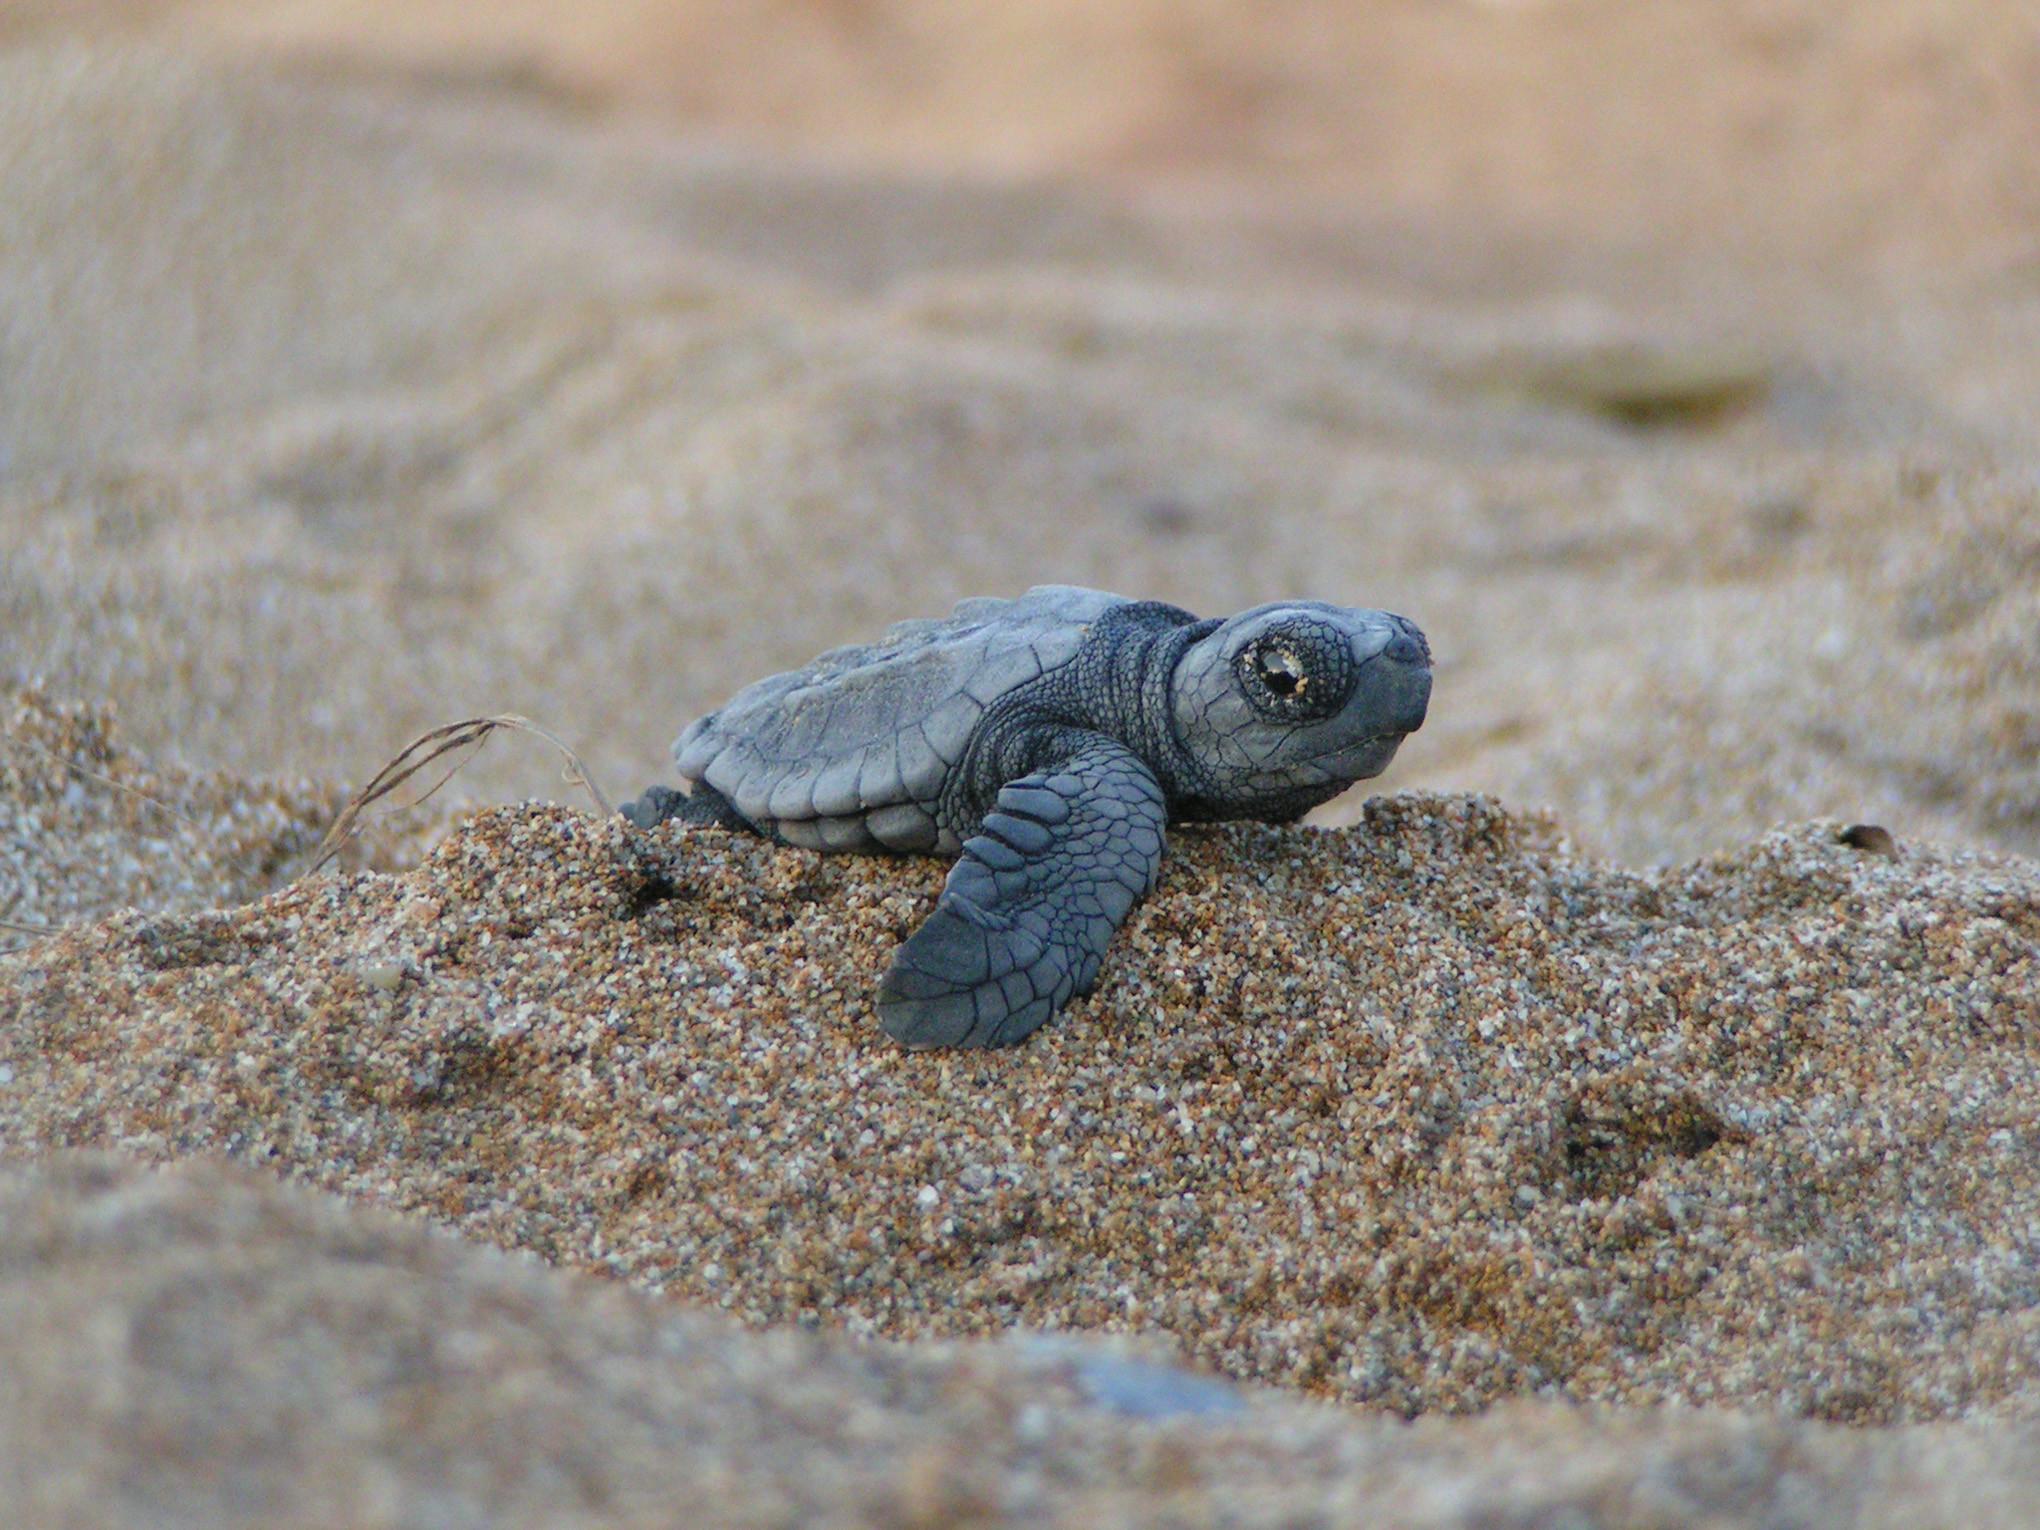 I wanna sea baby sea turtles hatch on a beach one day